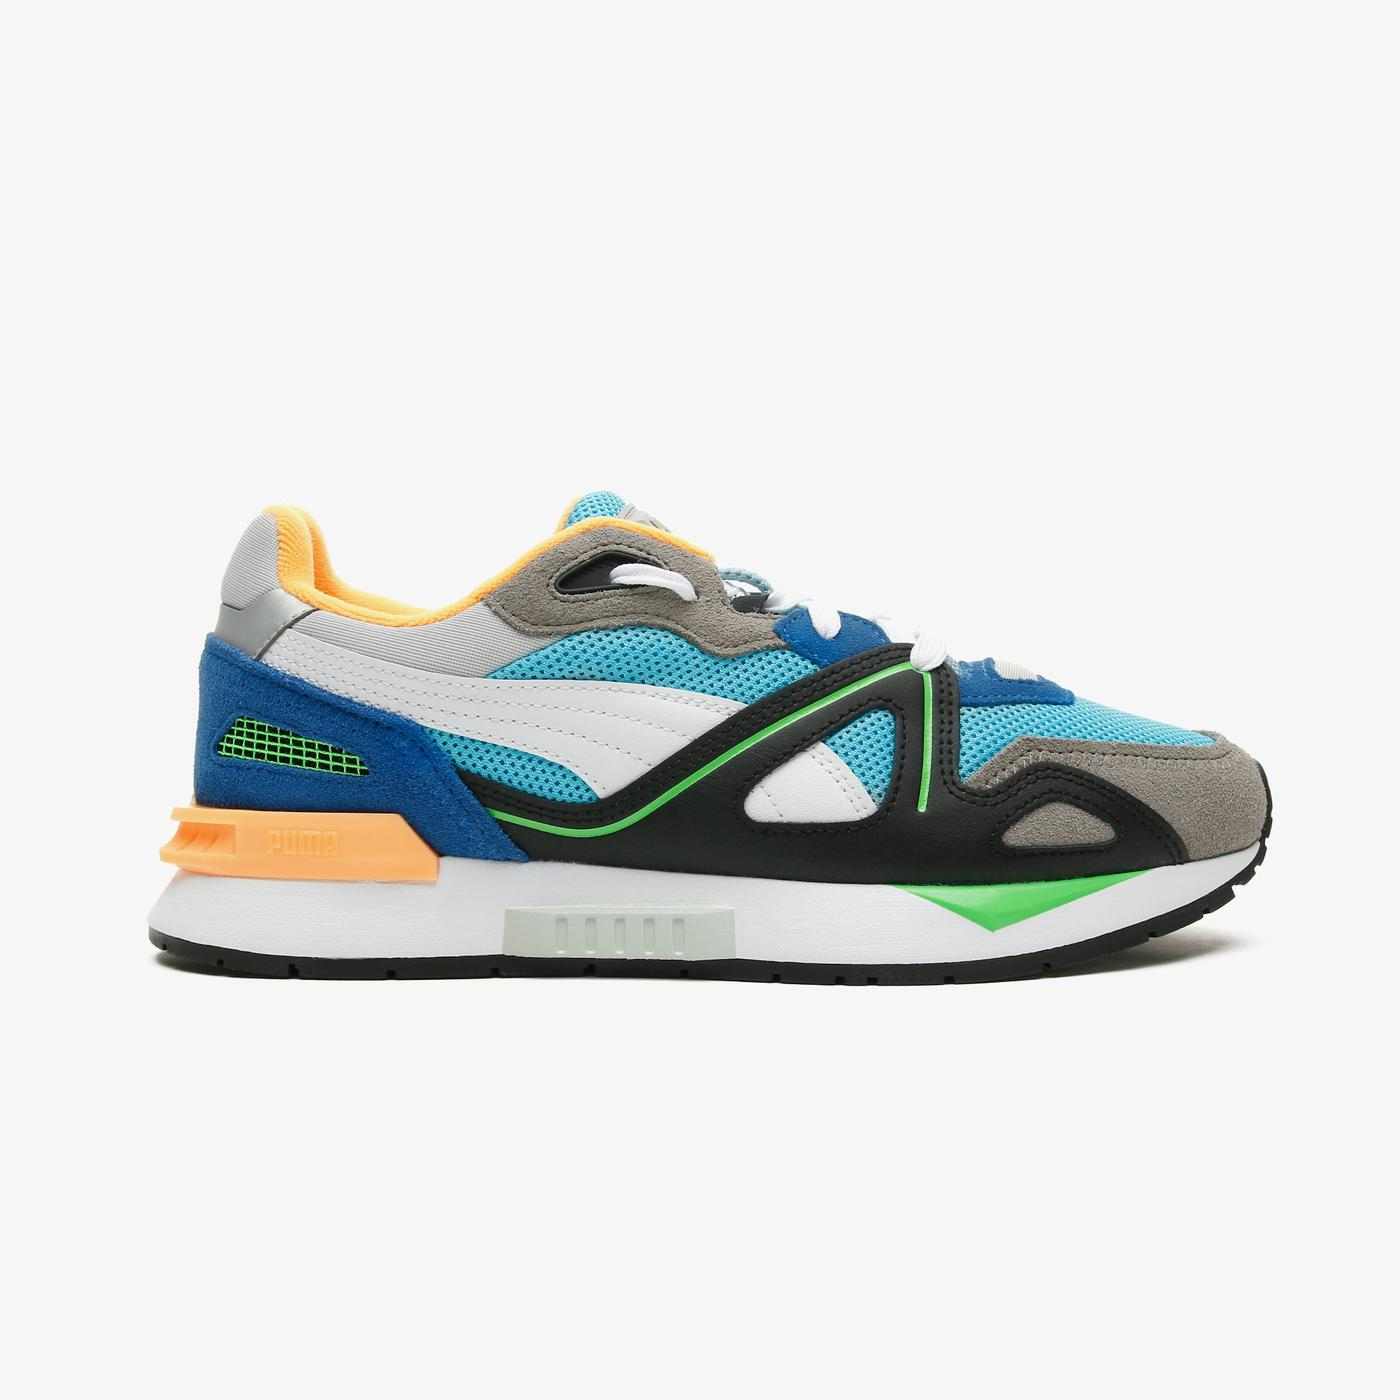 Puma Mirage Mox Vision Erkek Mavi Spor Ayakkabı